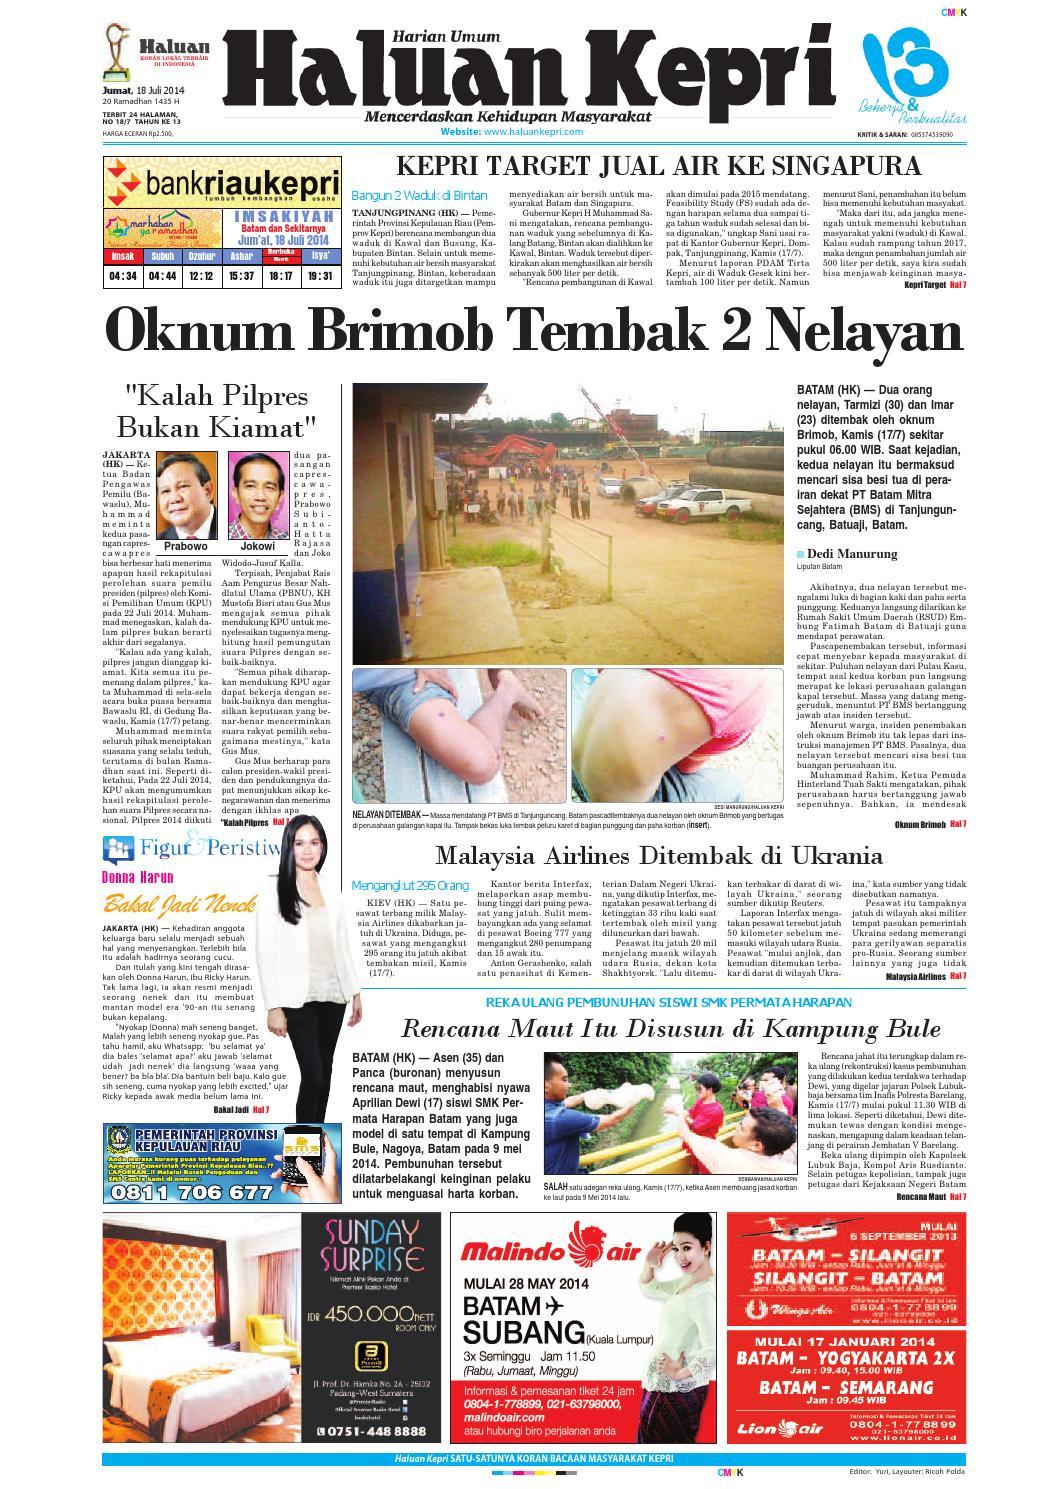 Haluankepri 18jul14 By Haluan Kepri Issuu Produk Umkm Bumn Bolu Gulung Hj Enong